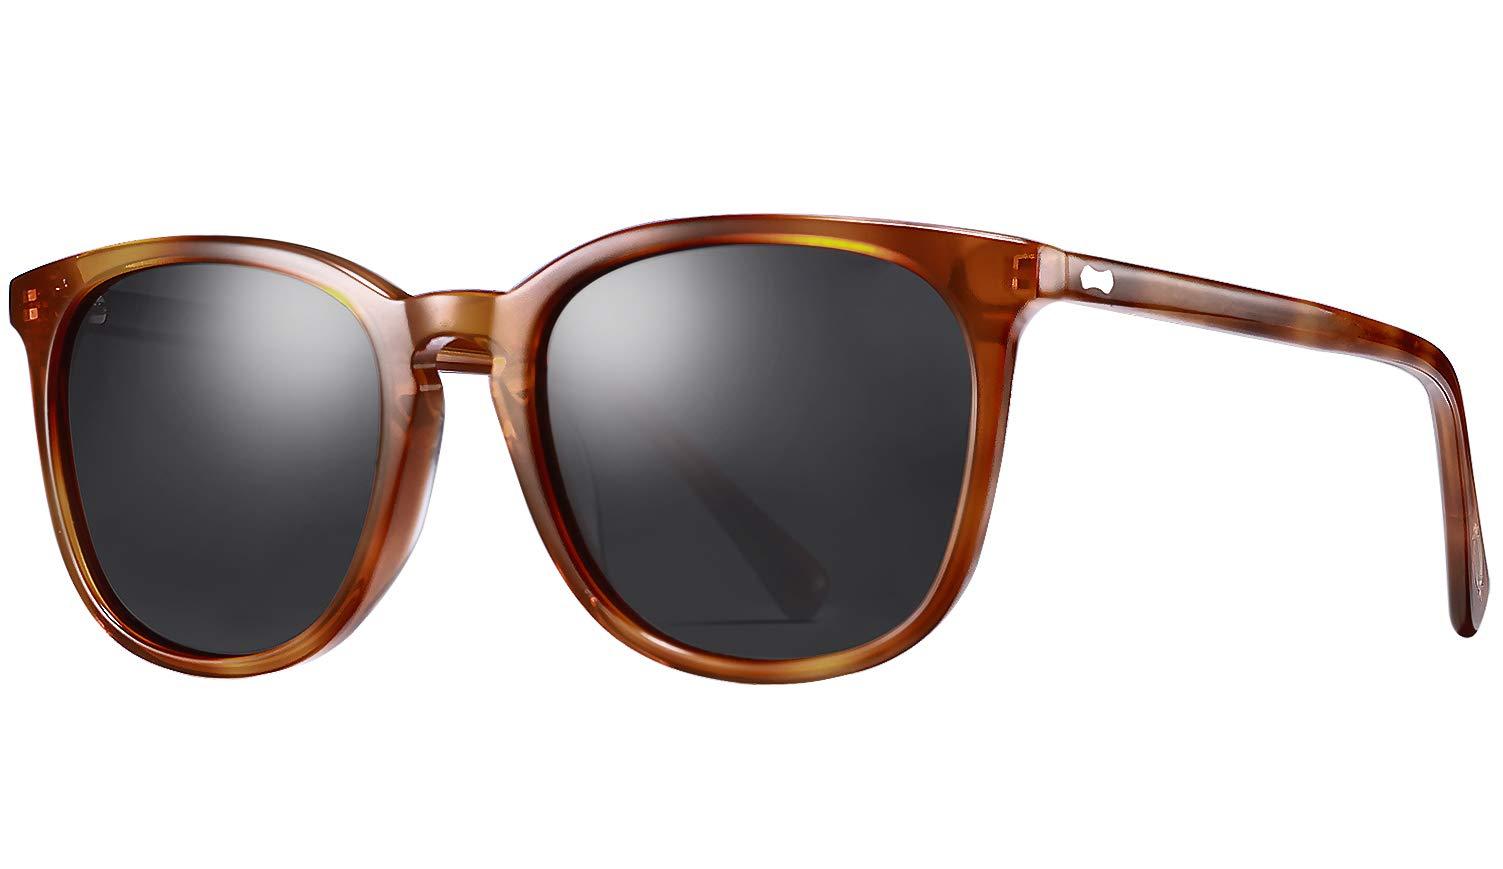 Carfia Polarized Sunglasses for Women Stylish Outdoor Eyewear UV400 Protection by Carfia